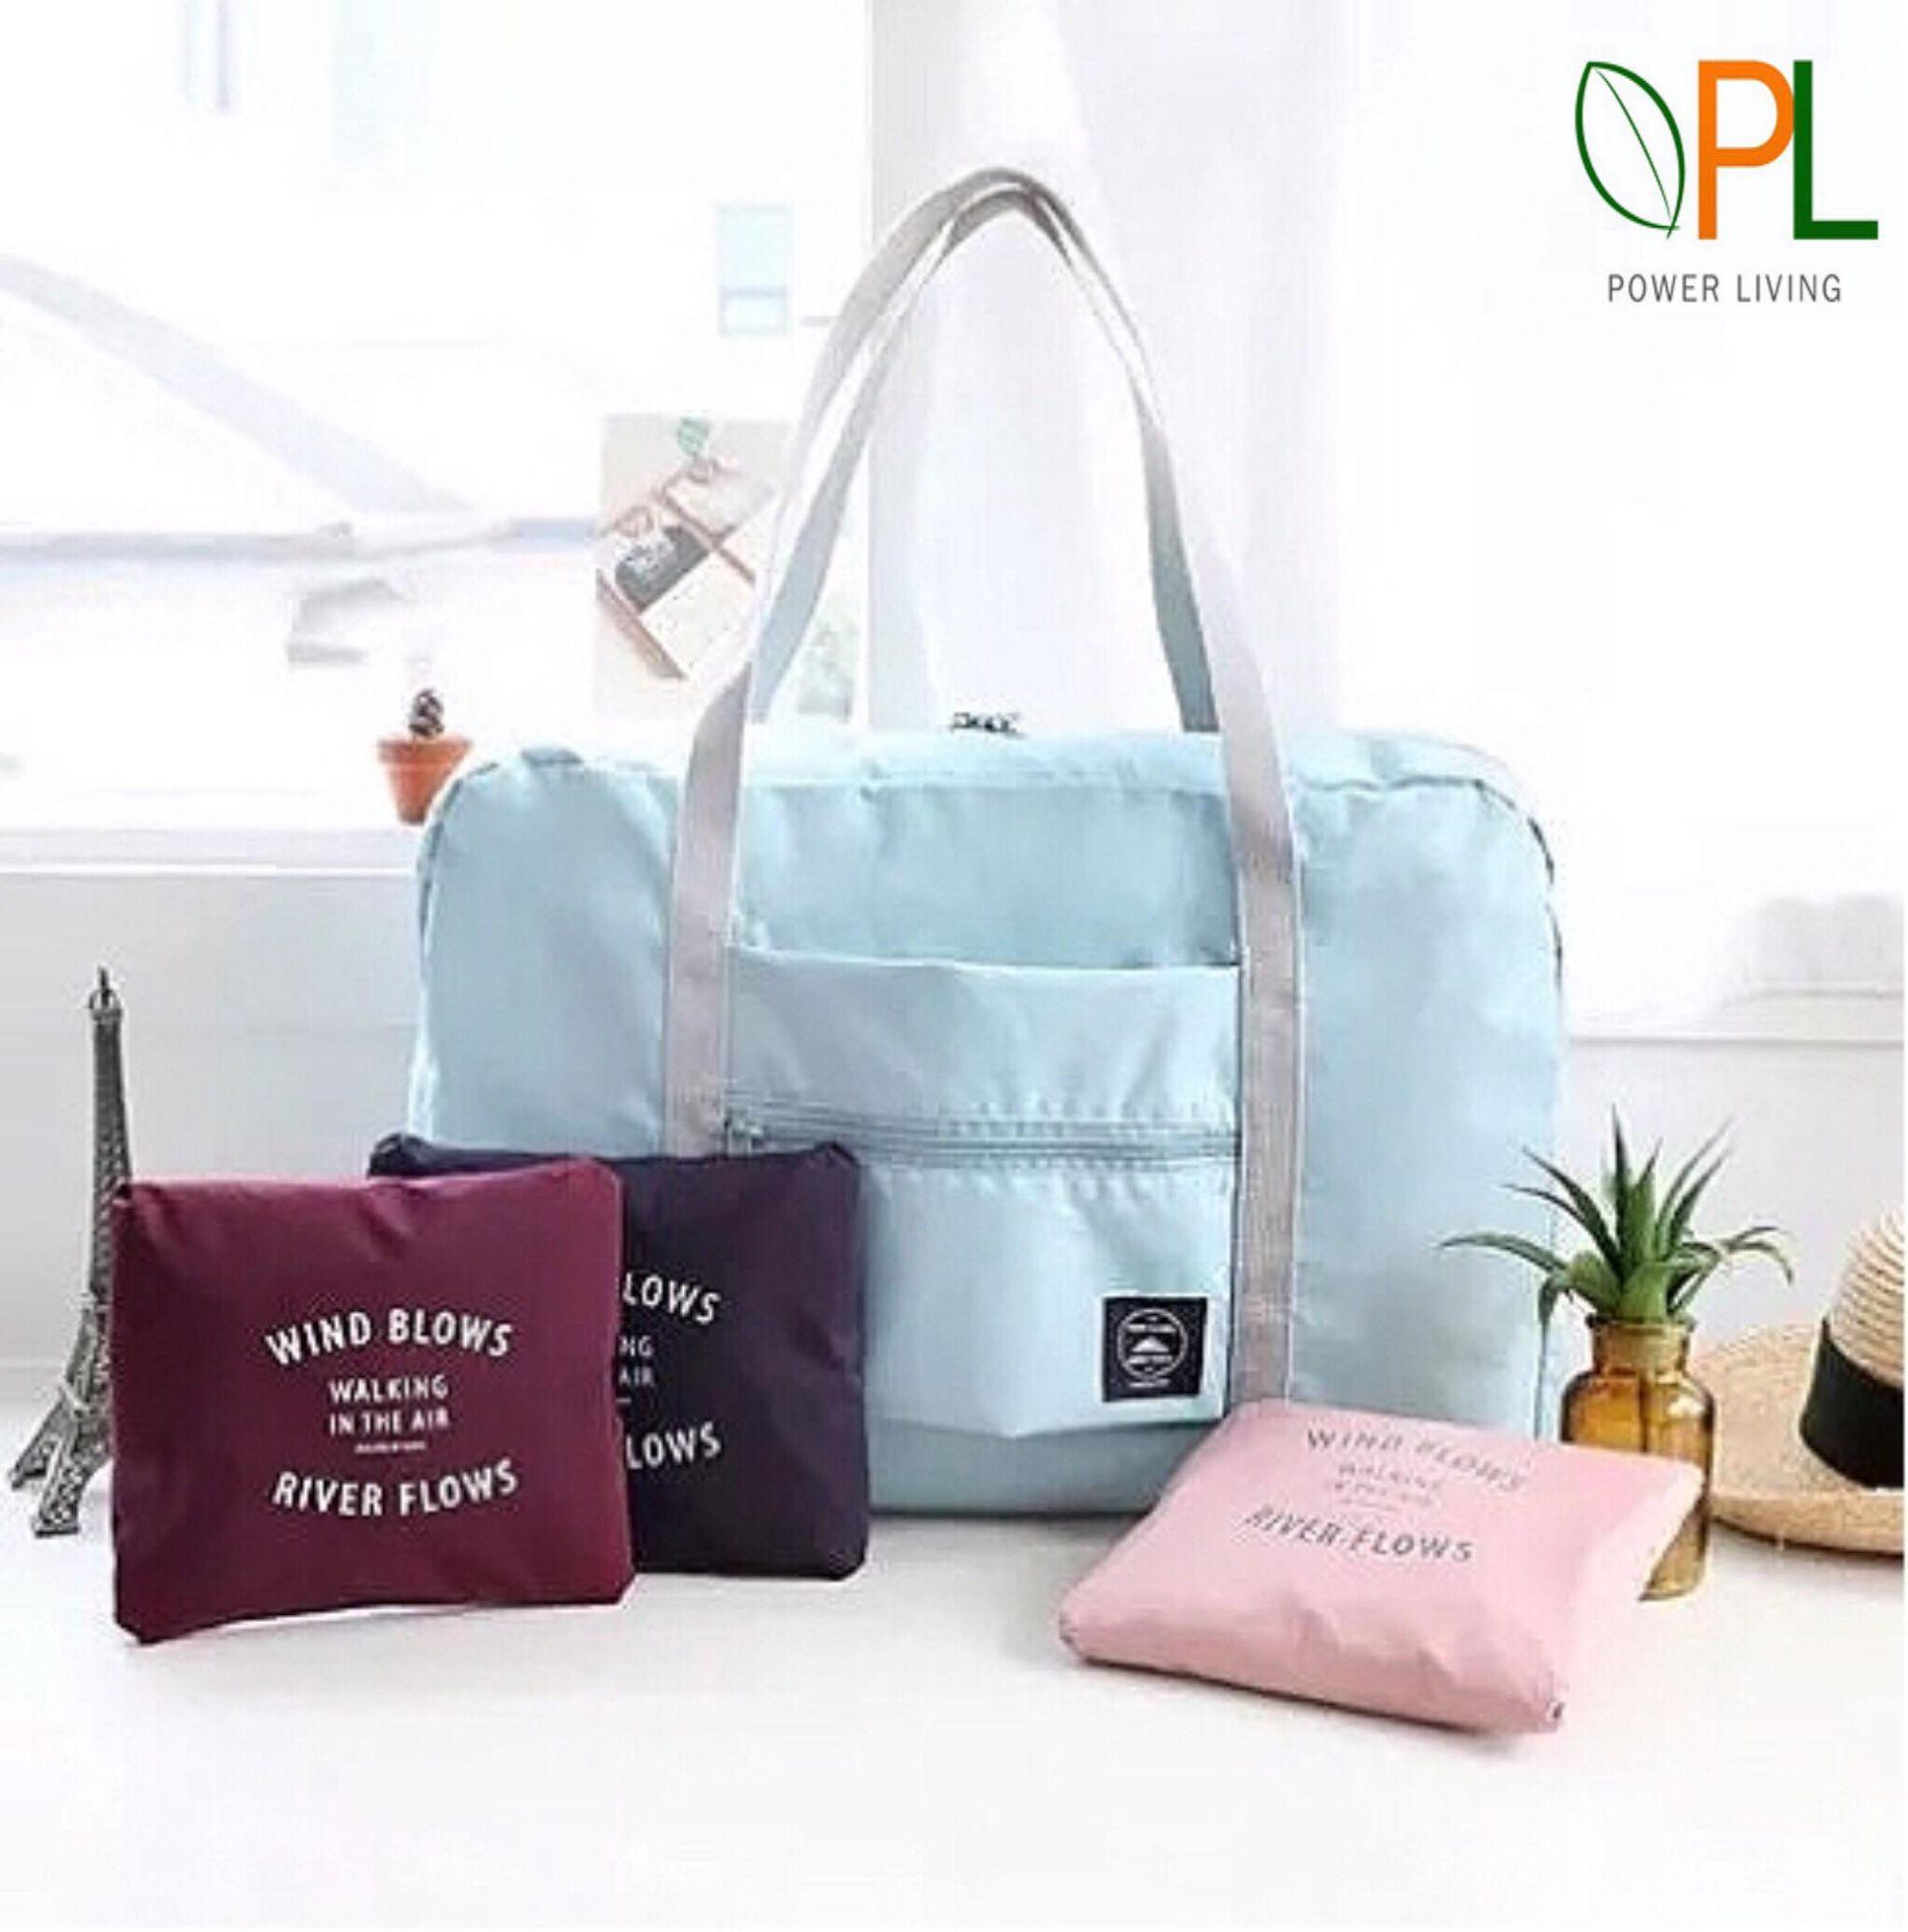 Foldable Travel Bag Travel Bag Luggage Bag Waterproof Travel Bag Clothes Package Nylon Big Capacity Foldable Wash Bag Makeup Outdoor Hanging Unisex Storage Bag Duffle Bag- Type D.